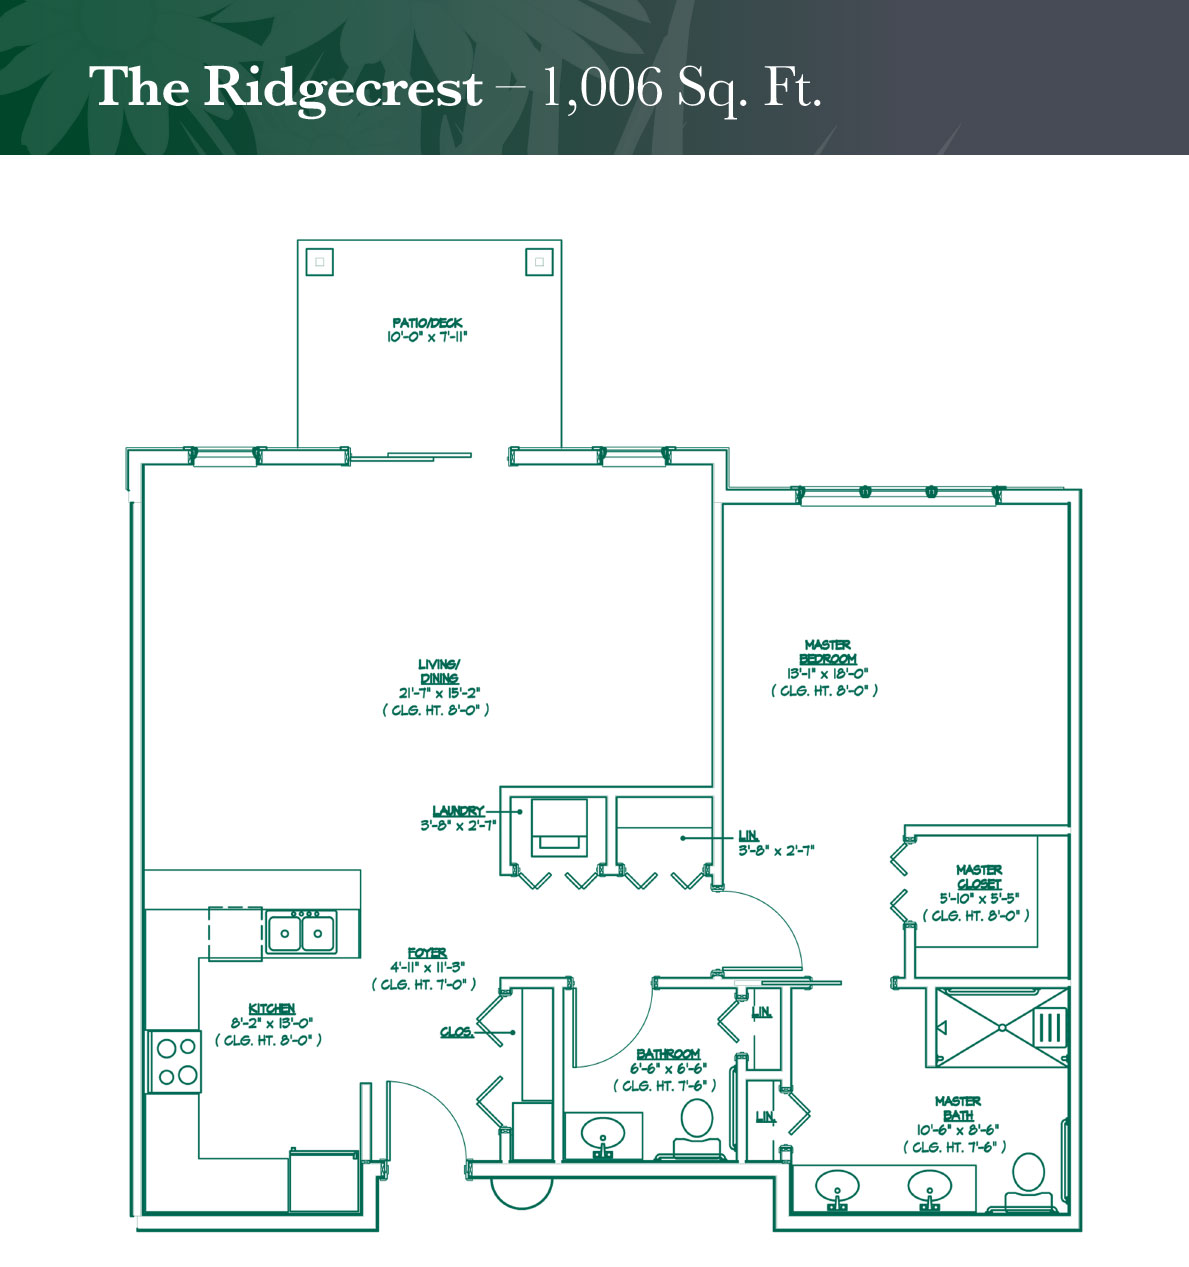 The Ridgecrest floorplan